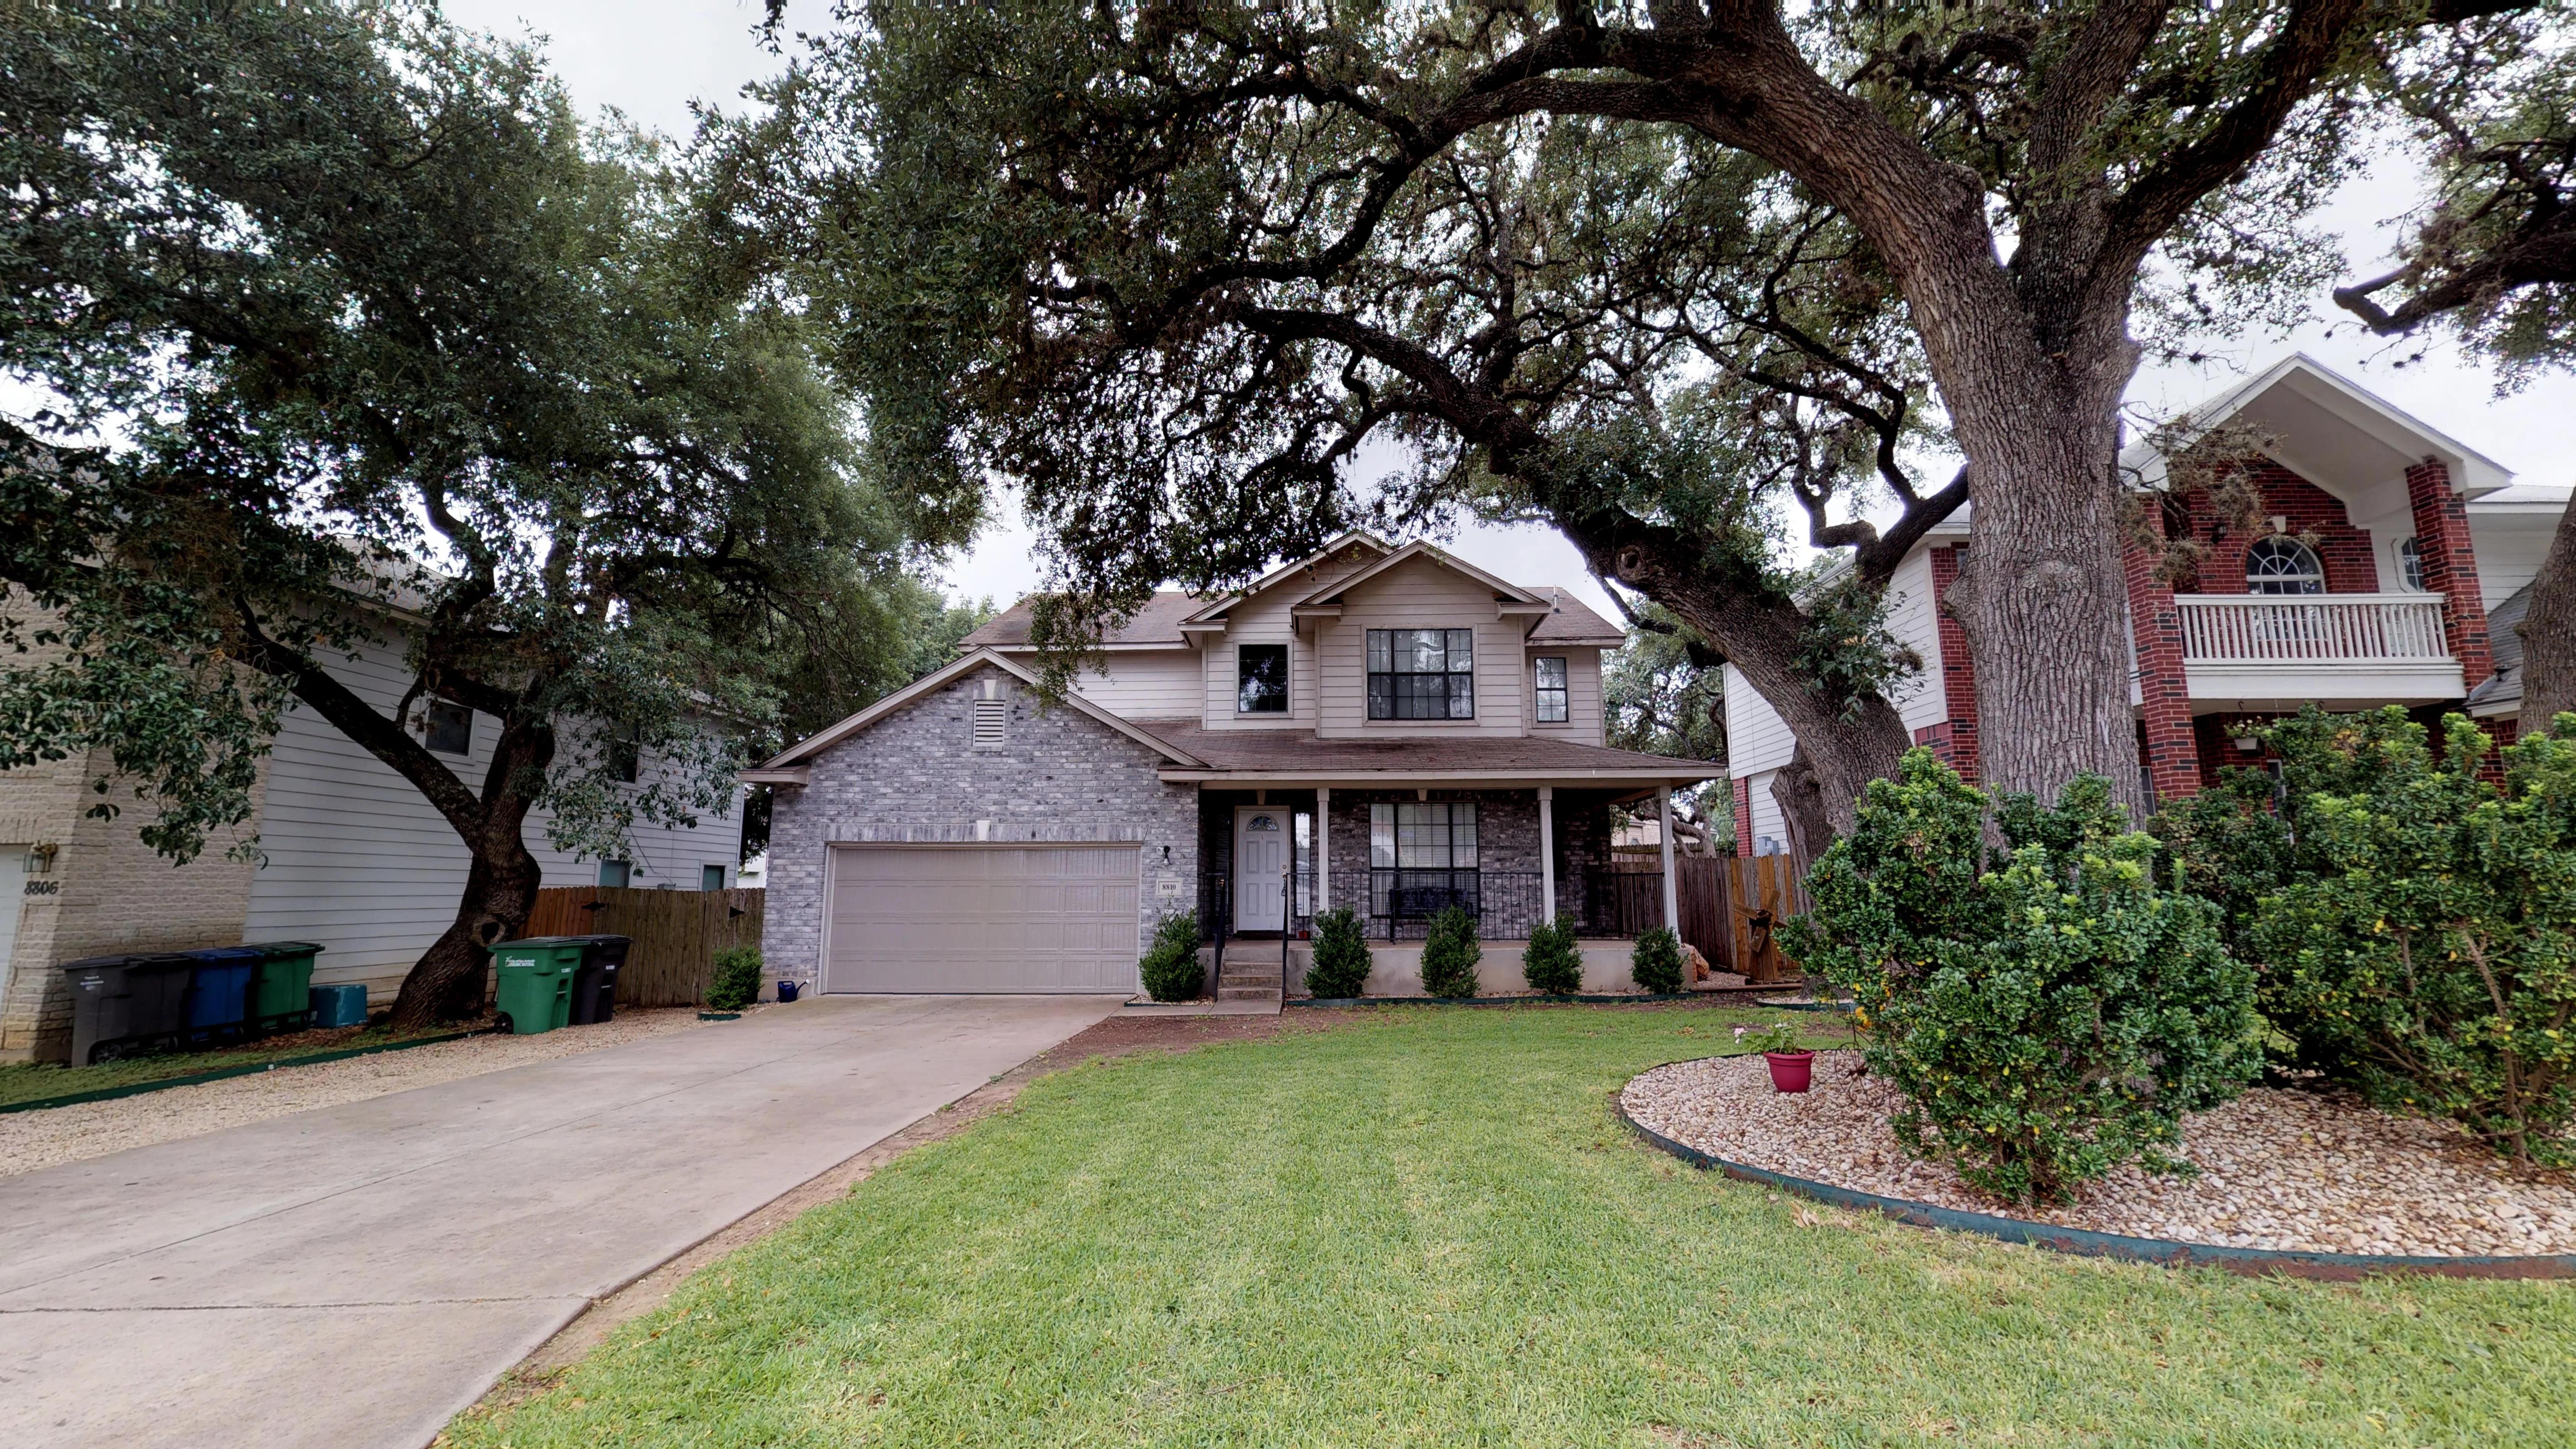 Home for Sale in San Antonio